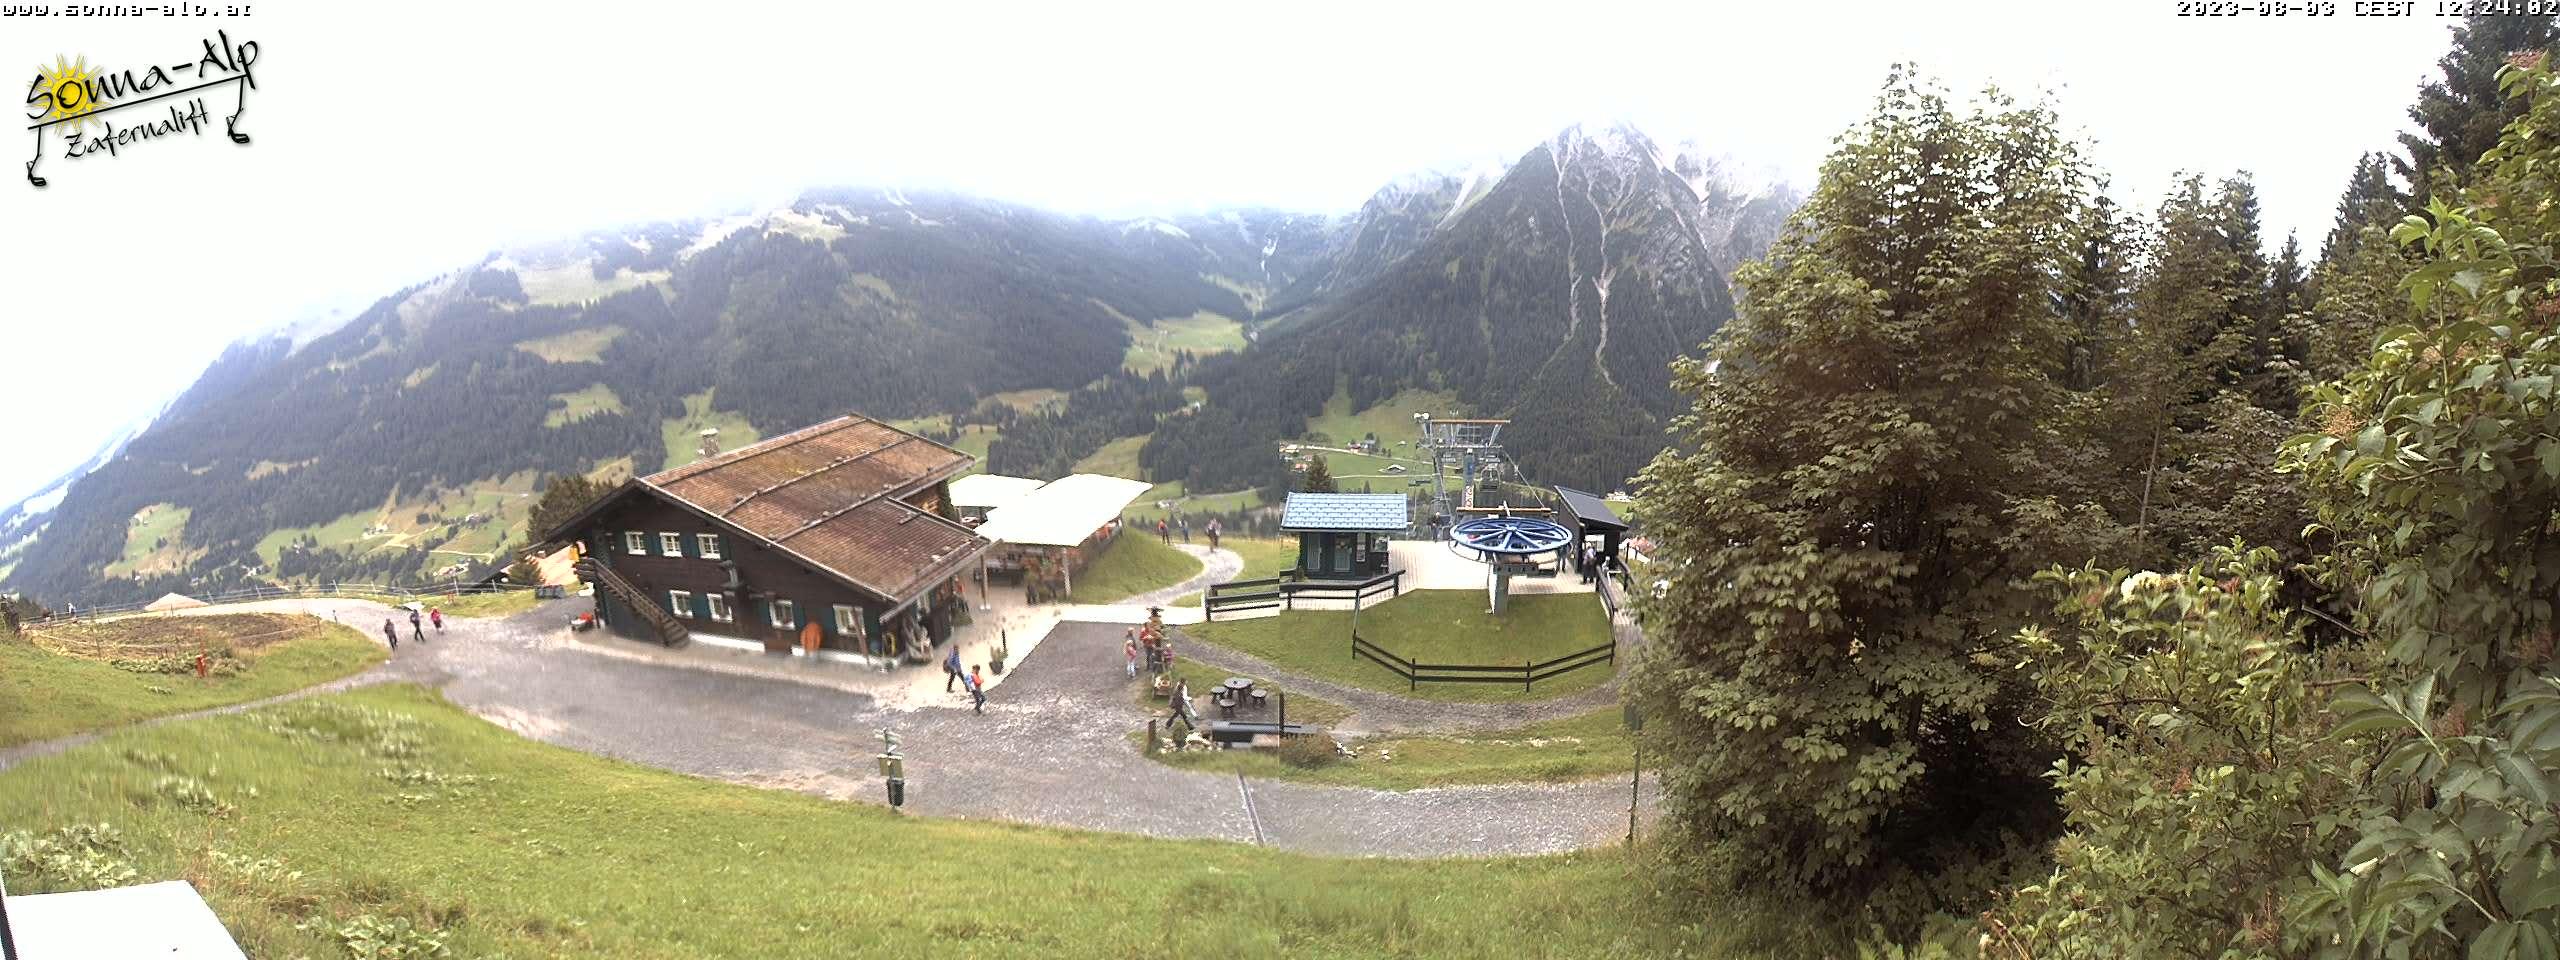 Talwandergebiet Zaferna